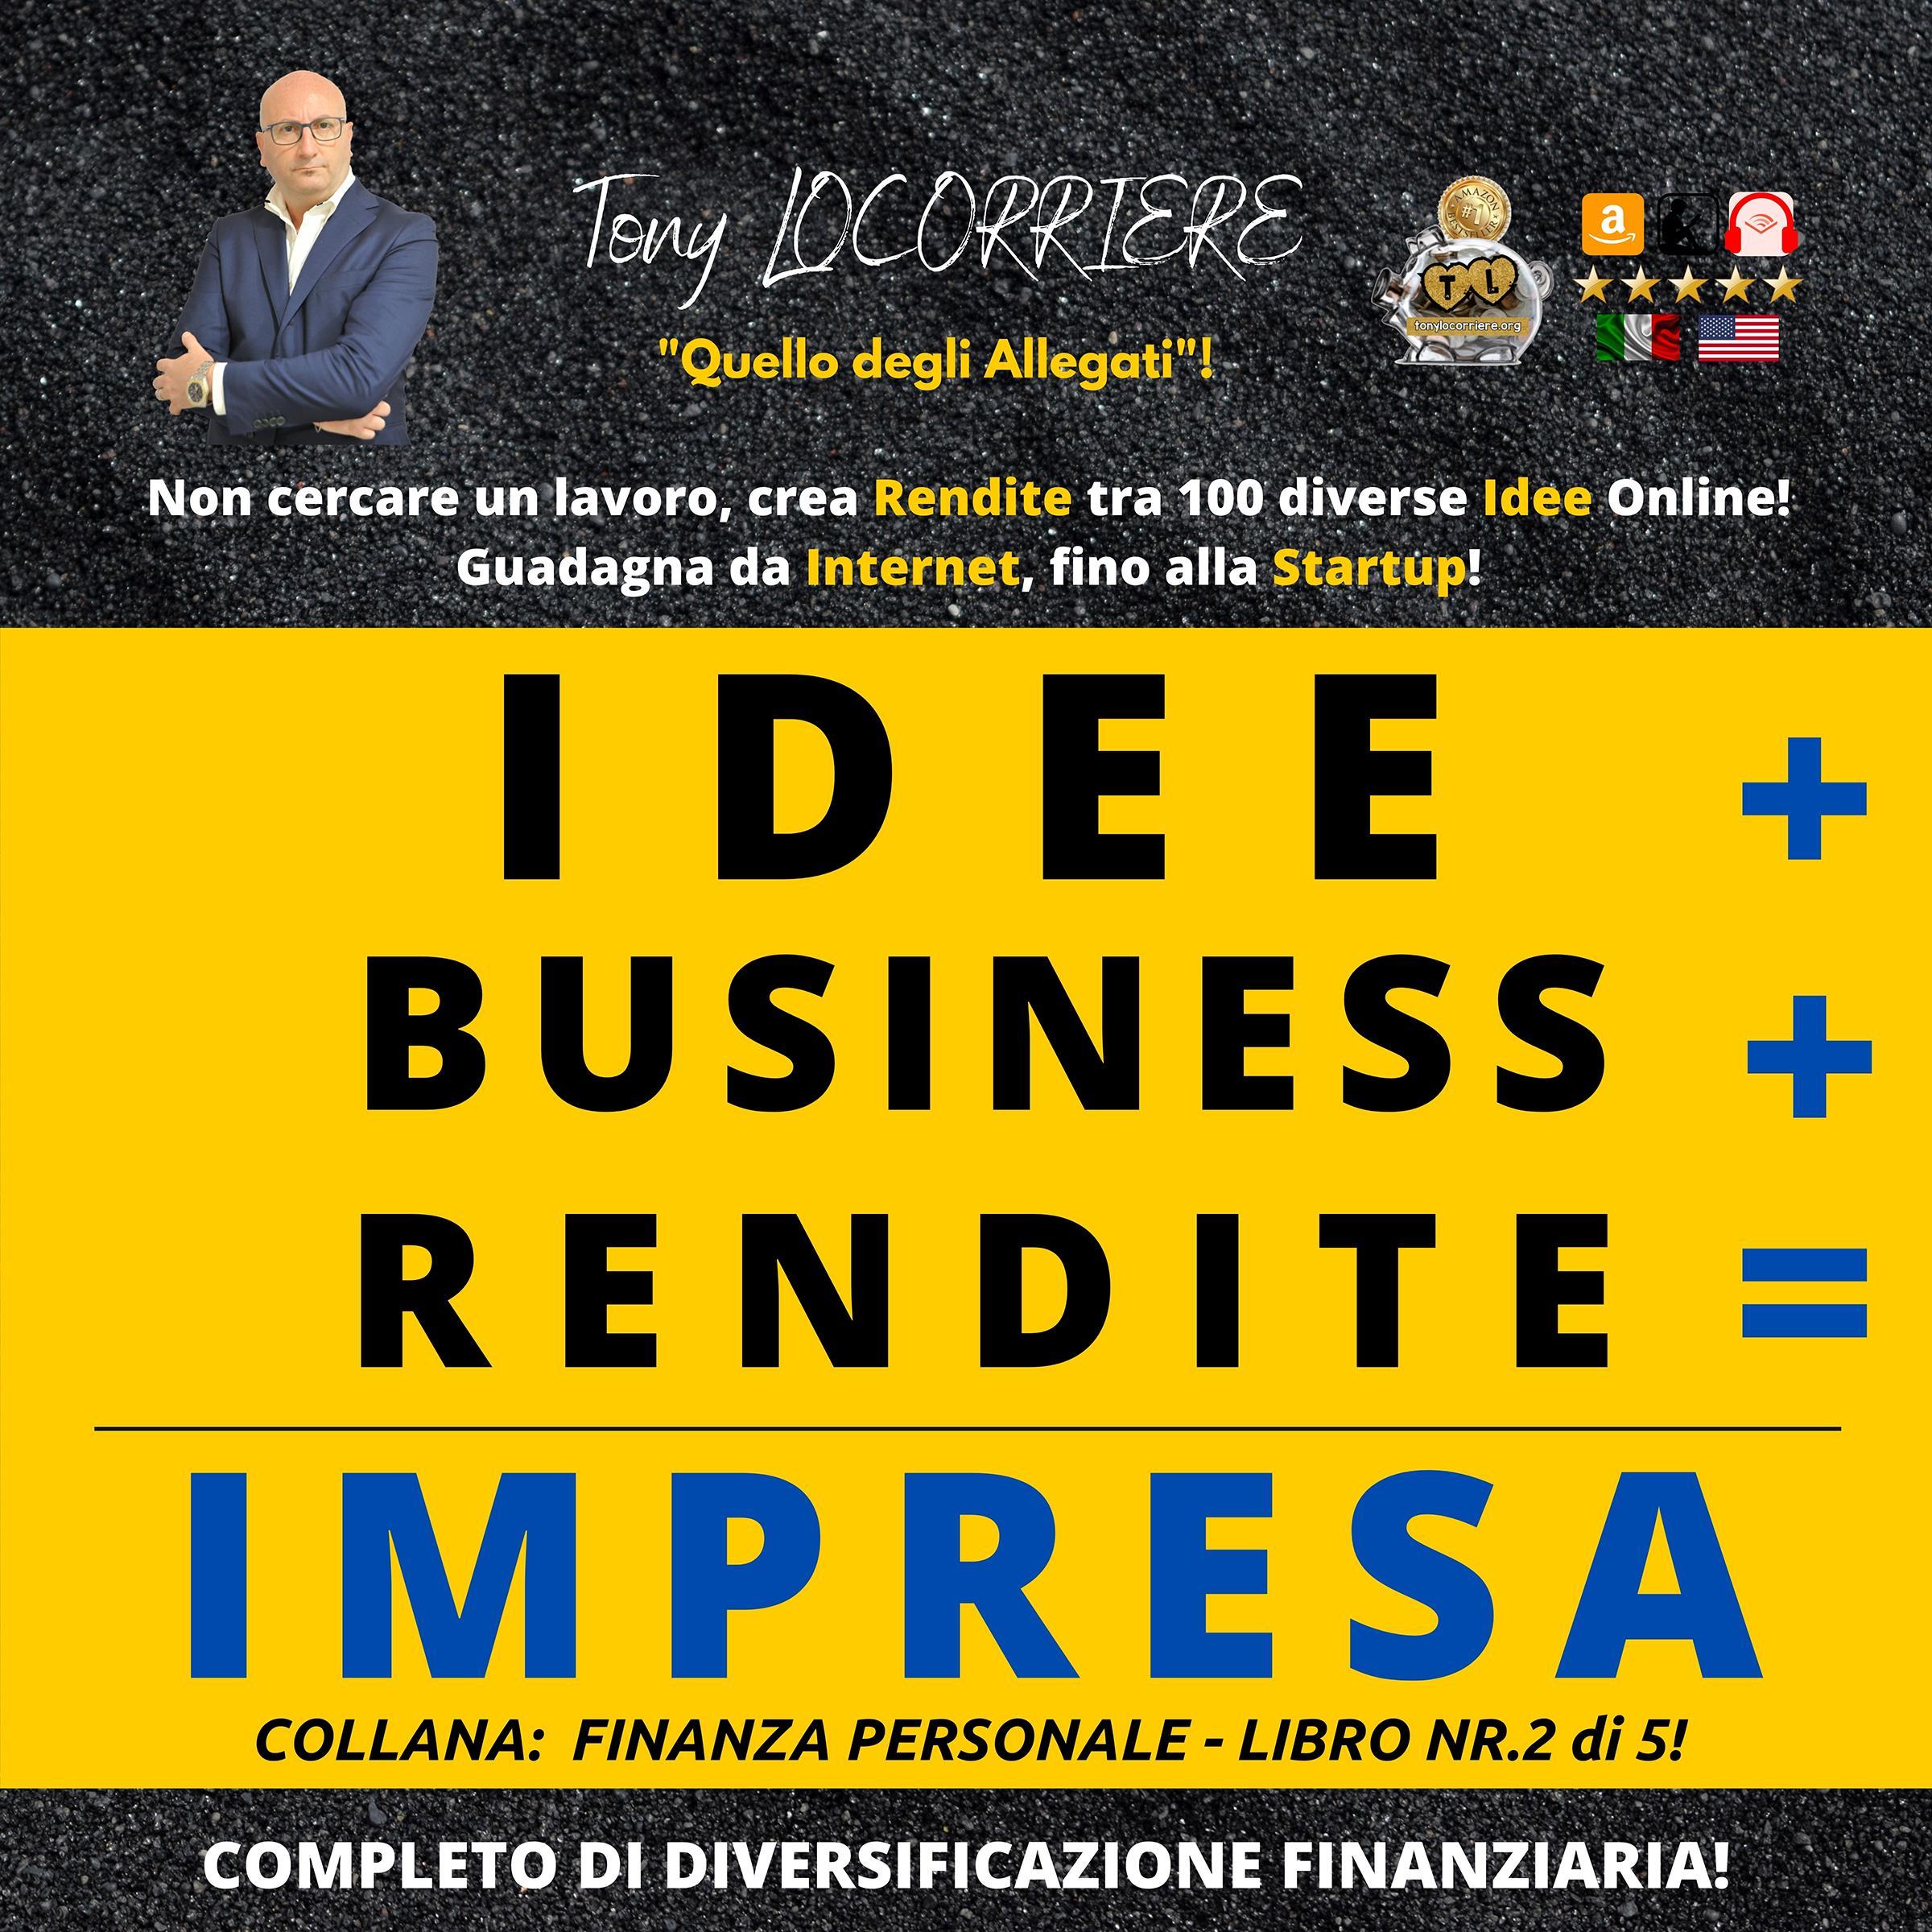 Idee Business Rendite Impresa